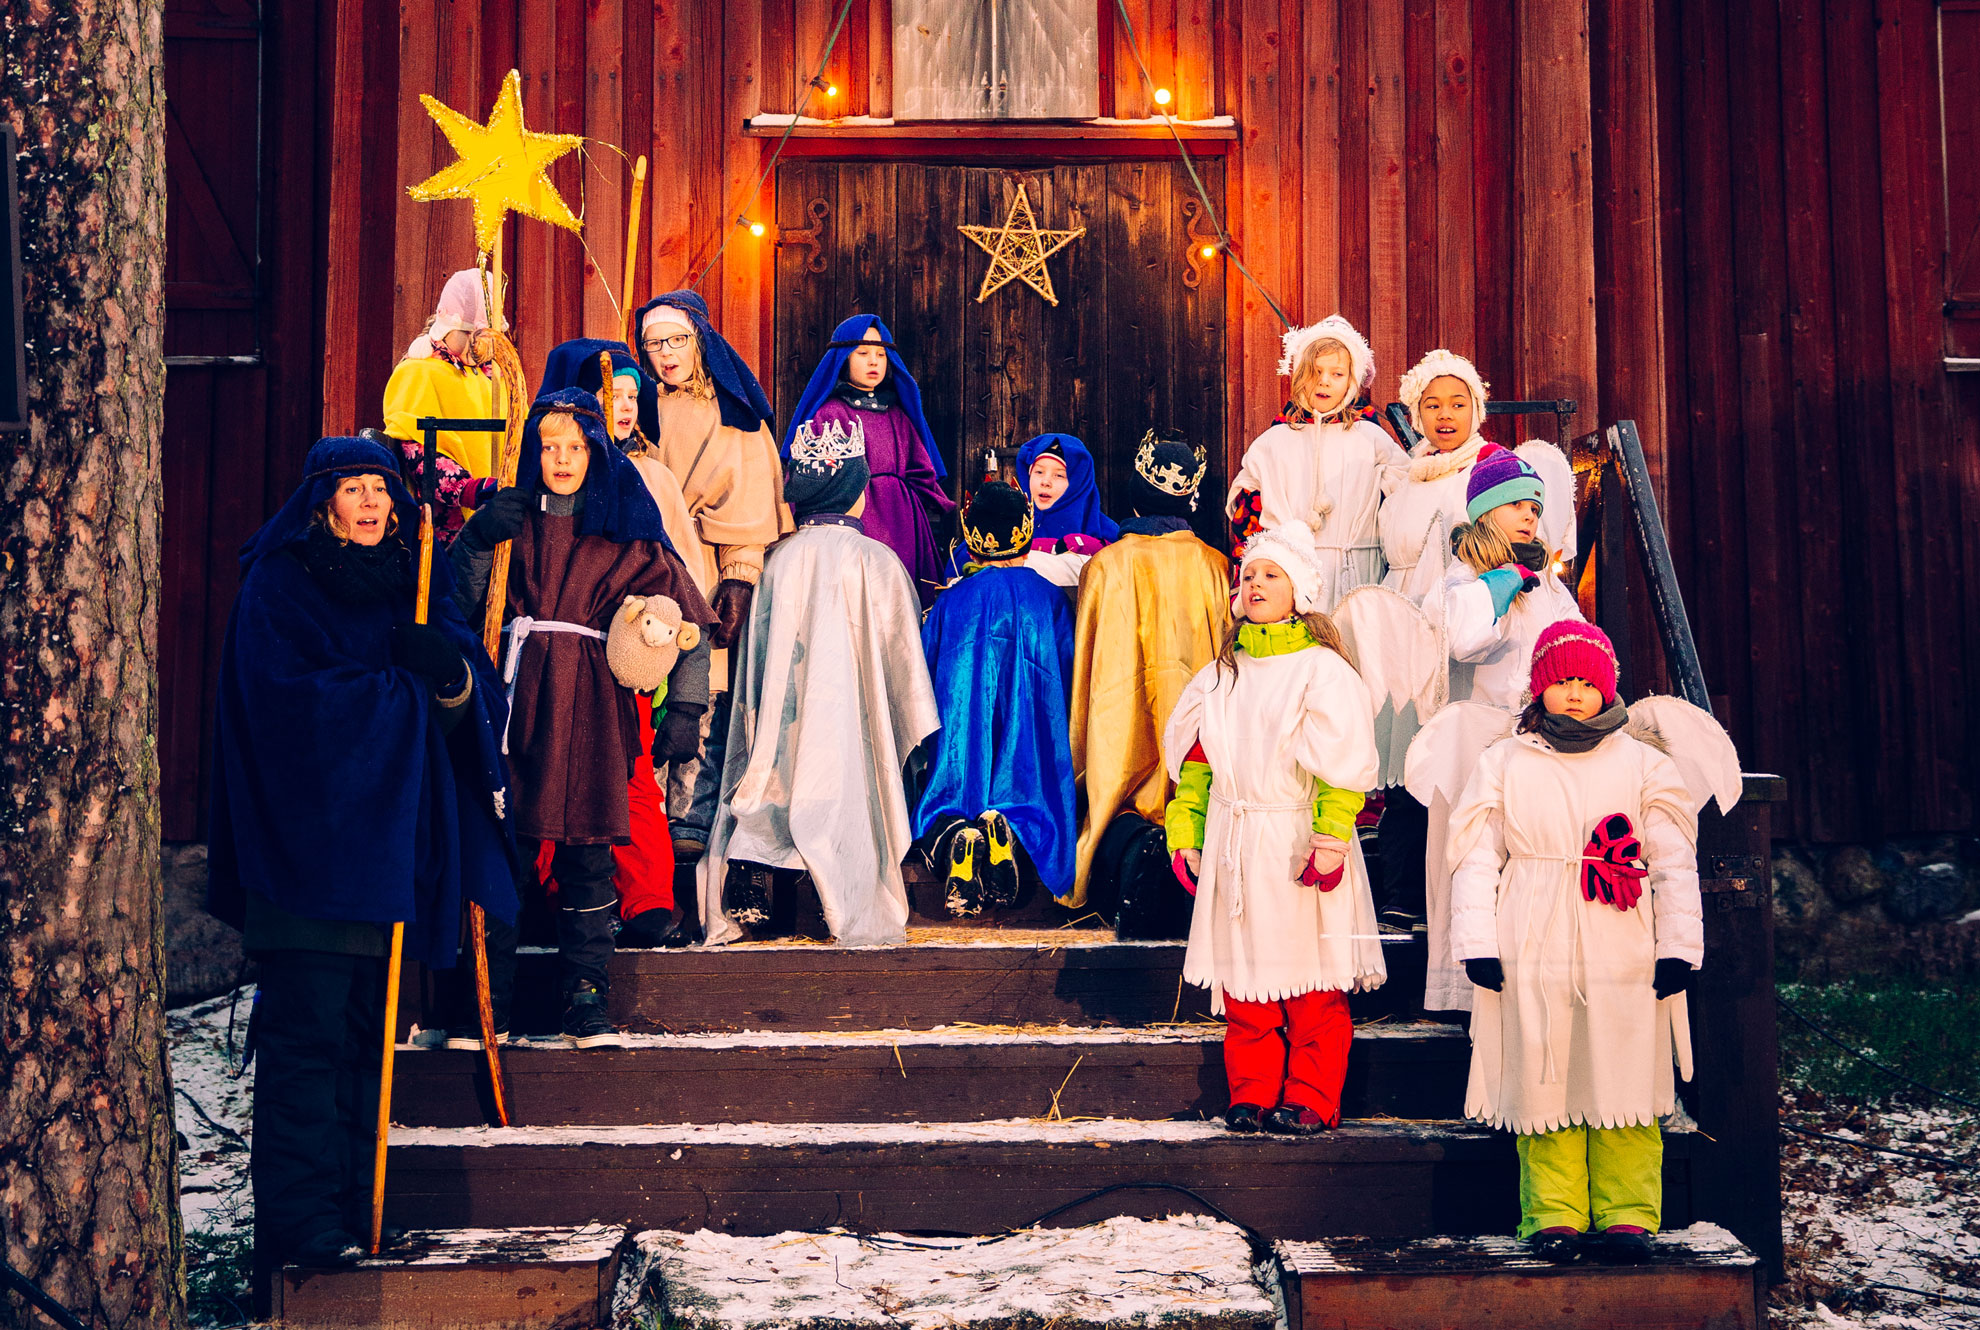 seurasaari joulu 2018 Seurasaari Christmas Path 2018 | My Helsinki seurasaari joulu 2018